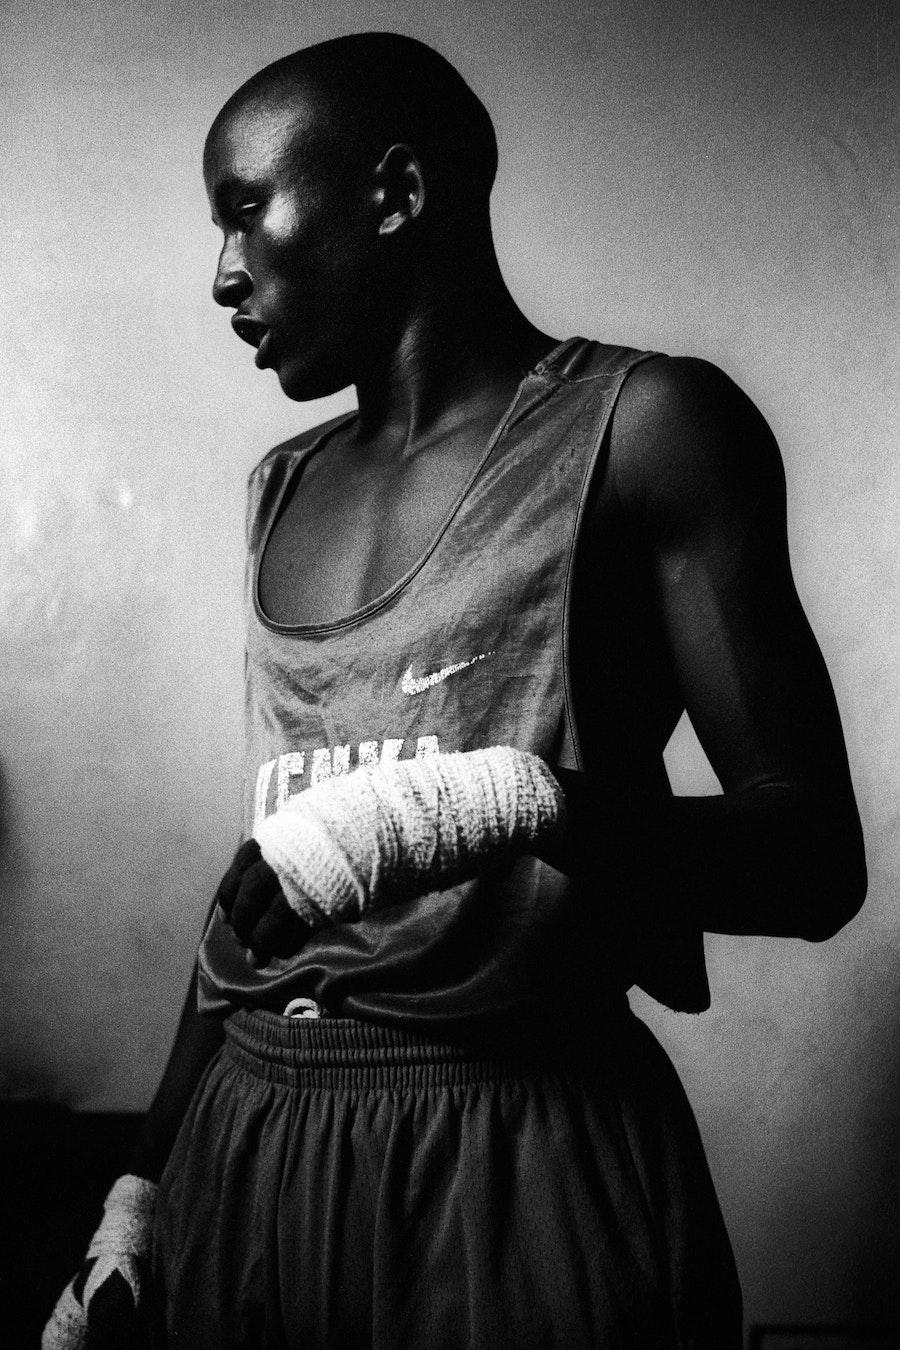 100318_Kibera-Olympic_004_26